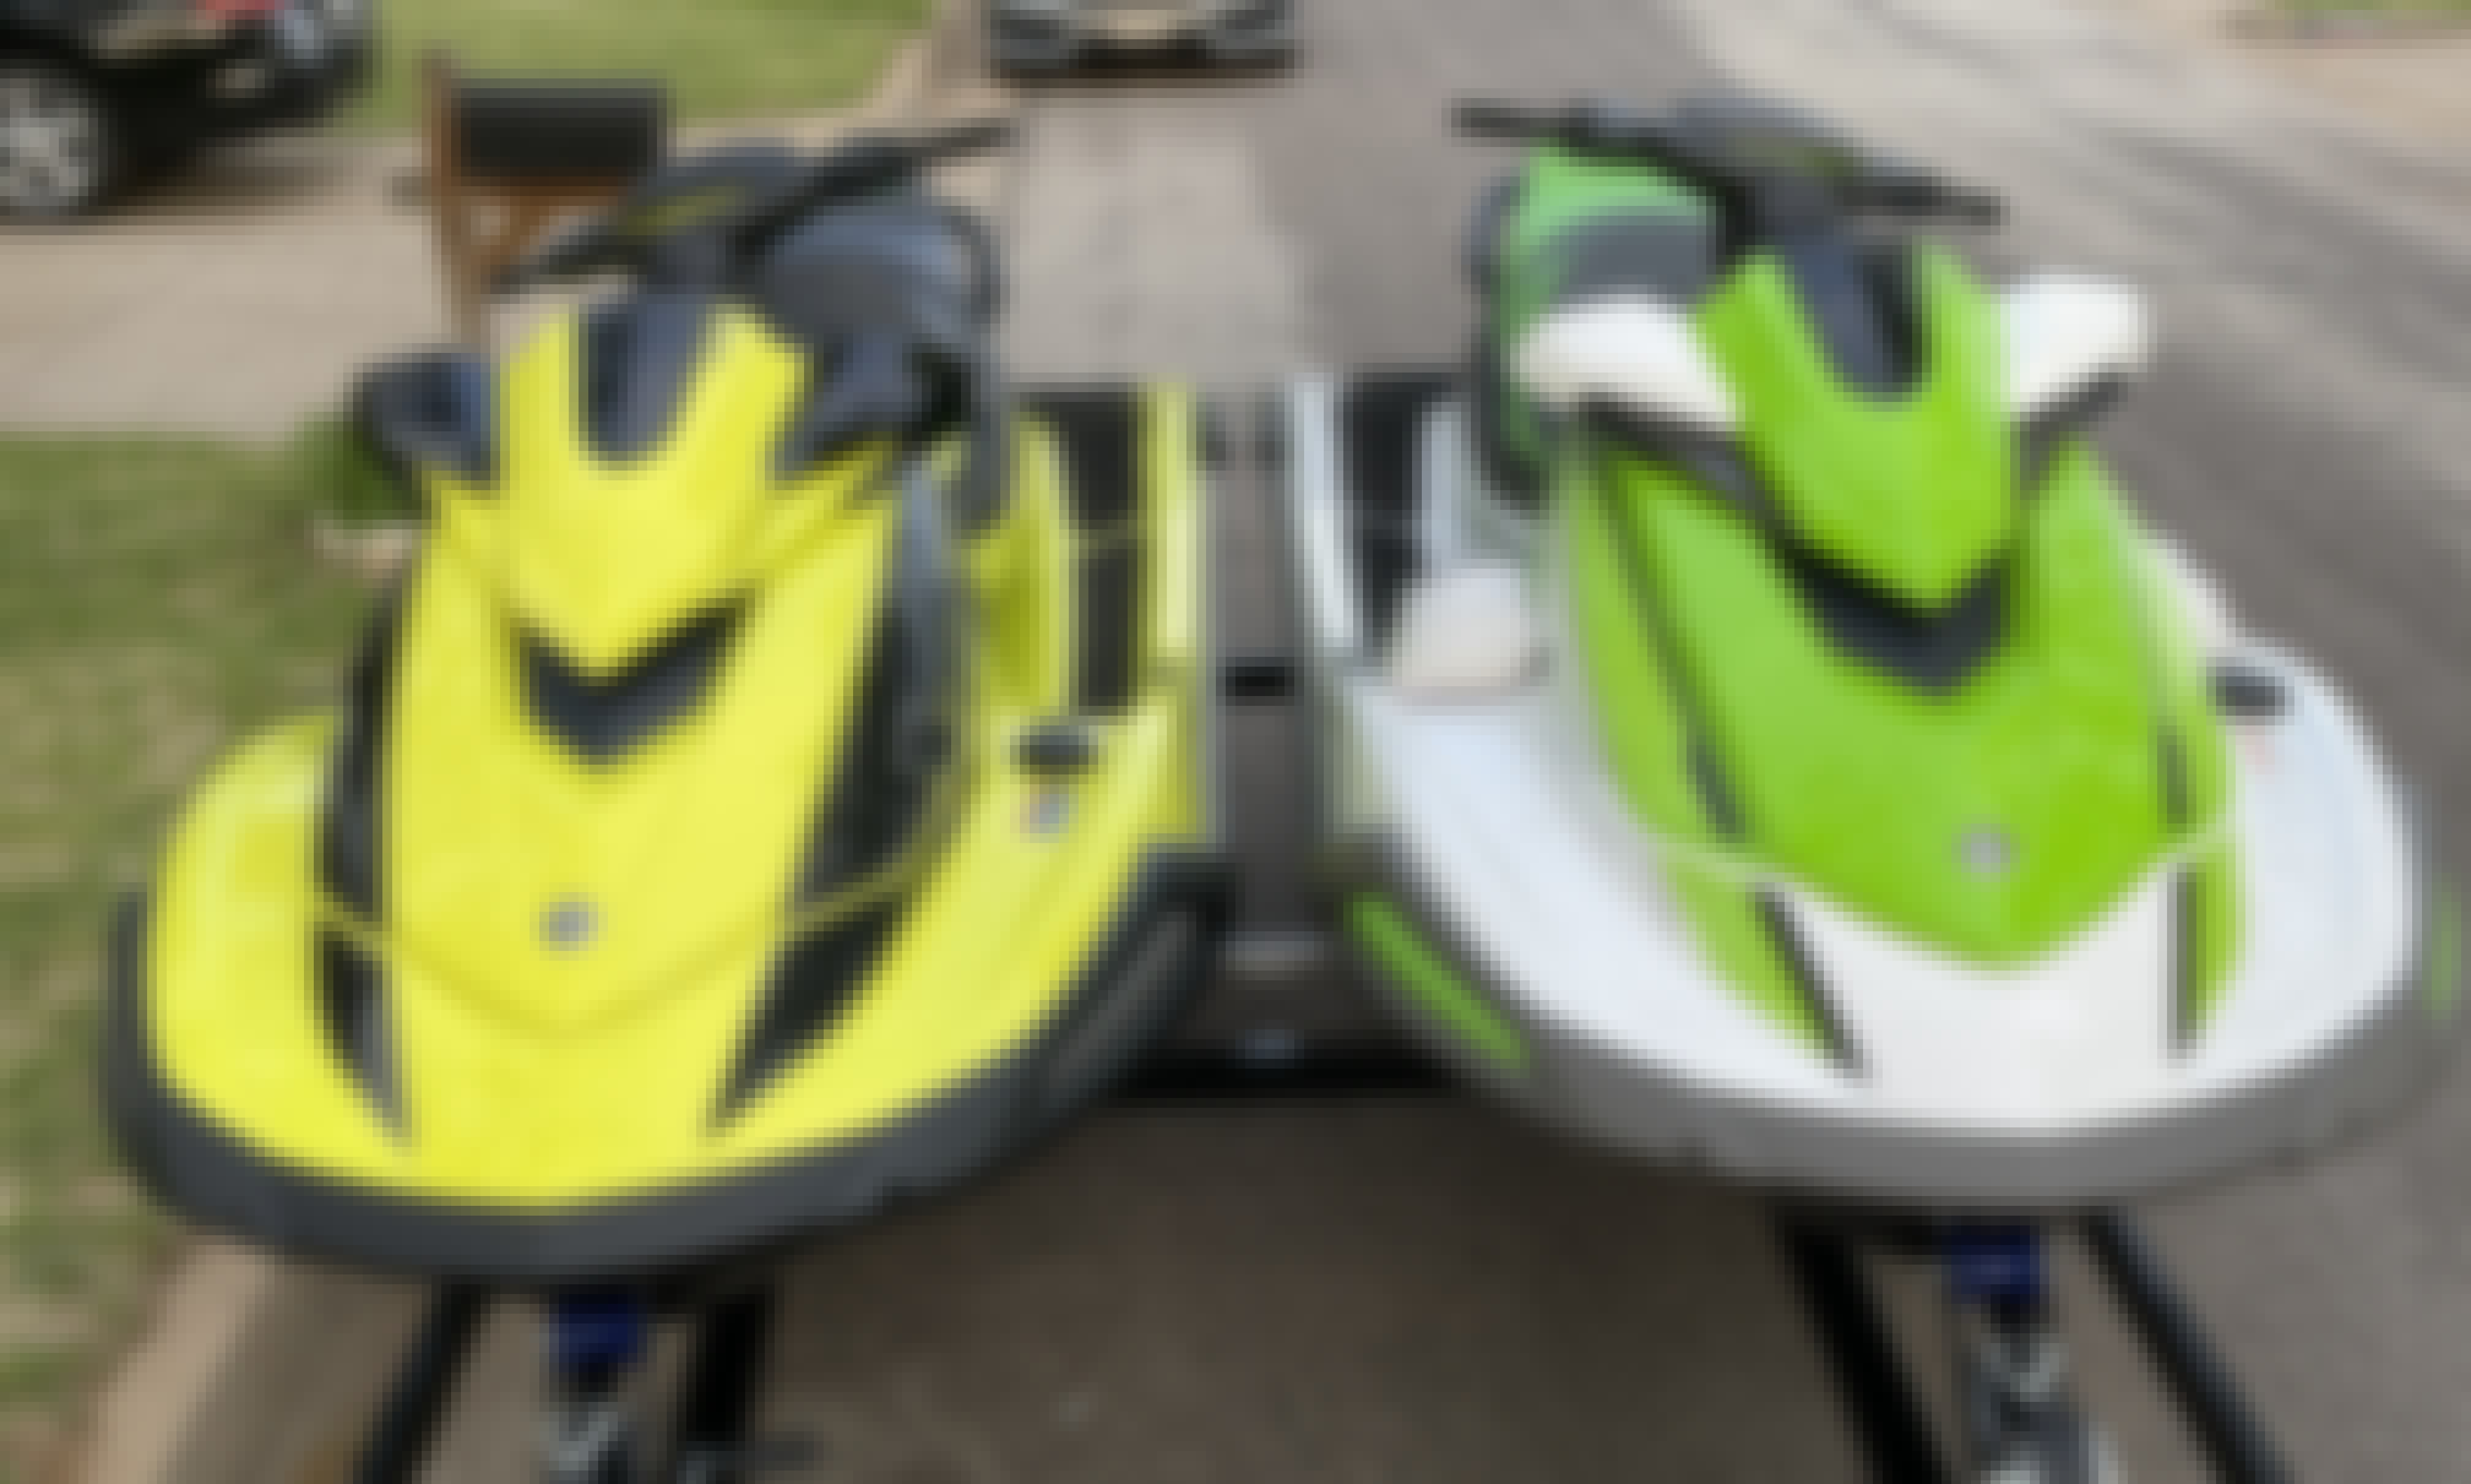 2021 Yamaha Waverunner Jet Skis For Rent x 2 | Lake Bridgeport